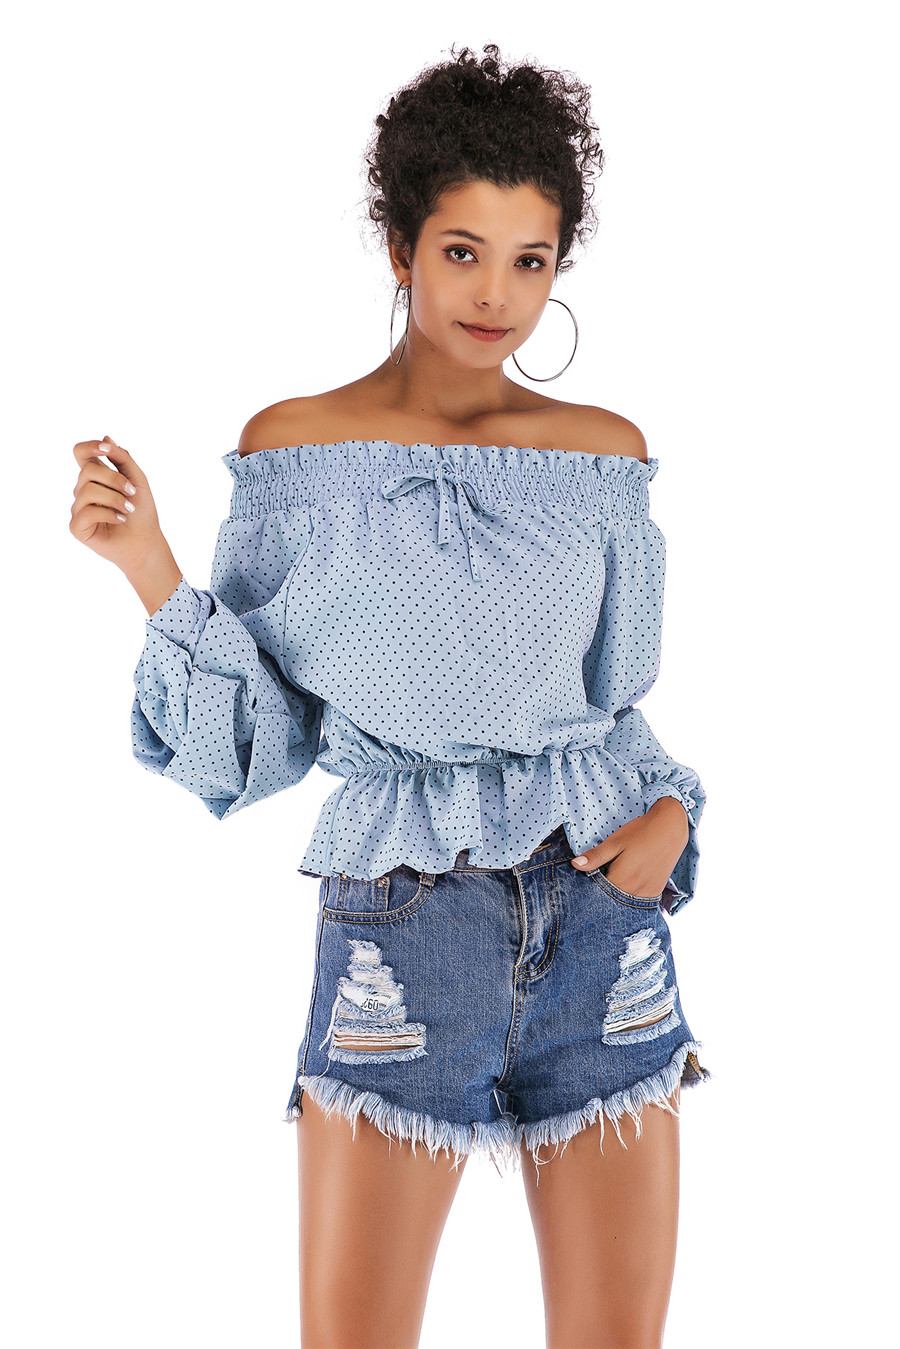 Gladiolus Chiffon Blouse Women 2019 Spring Autumn Long Sleeve Polka Dot Off Shoulder Sexy Blouses Women Shirts Ruffles Blusas (19)